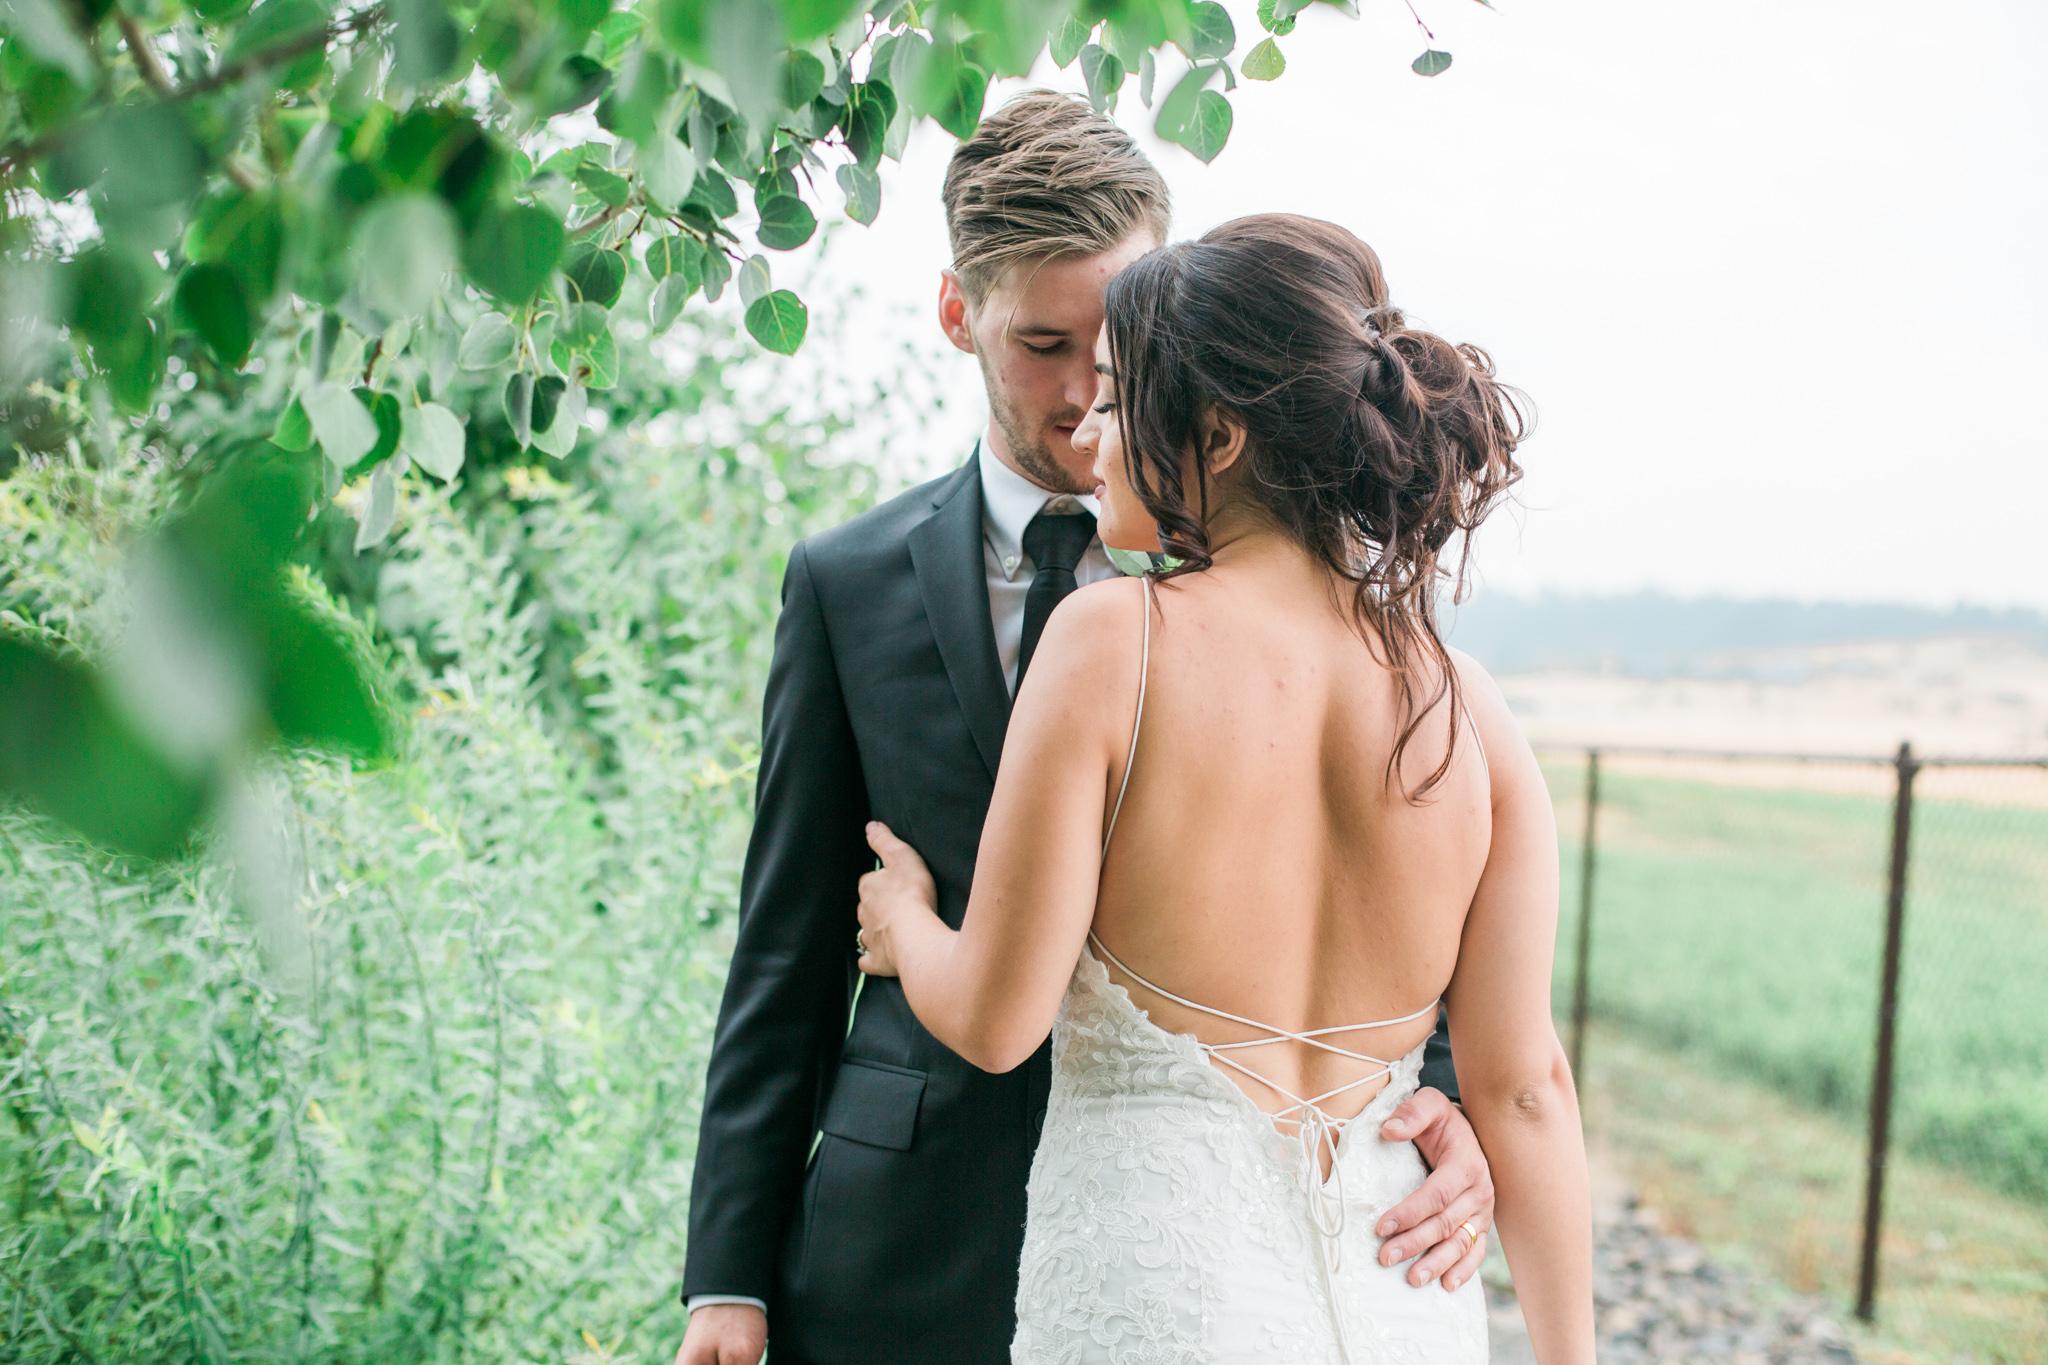 Olga_janni_wedding_090917_WEBSIZE (479 of 704).JPG